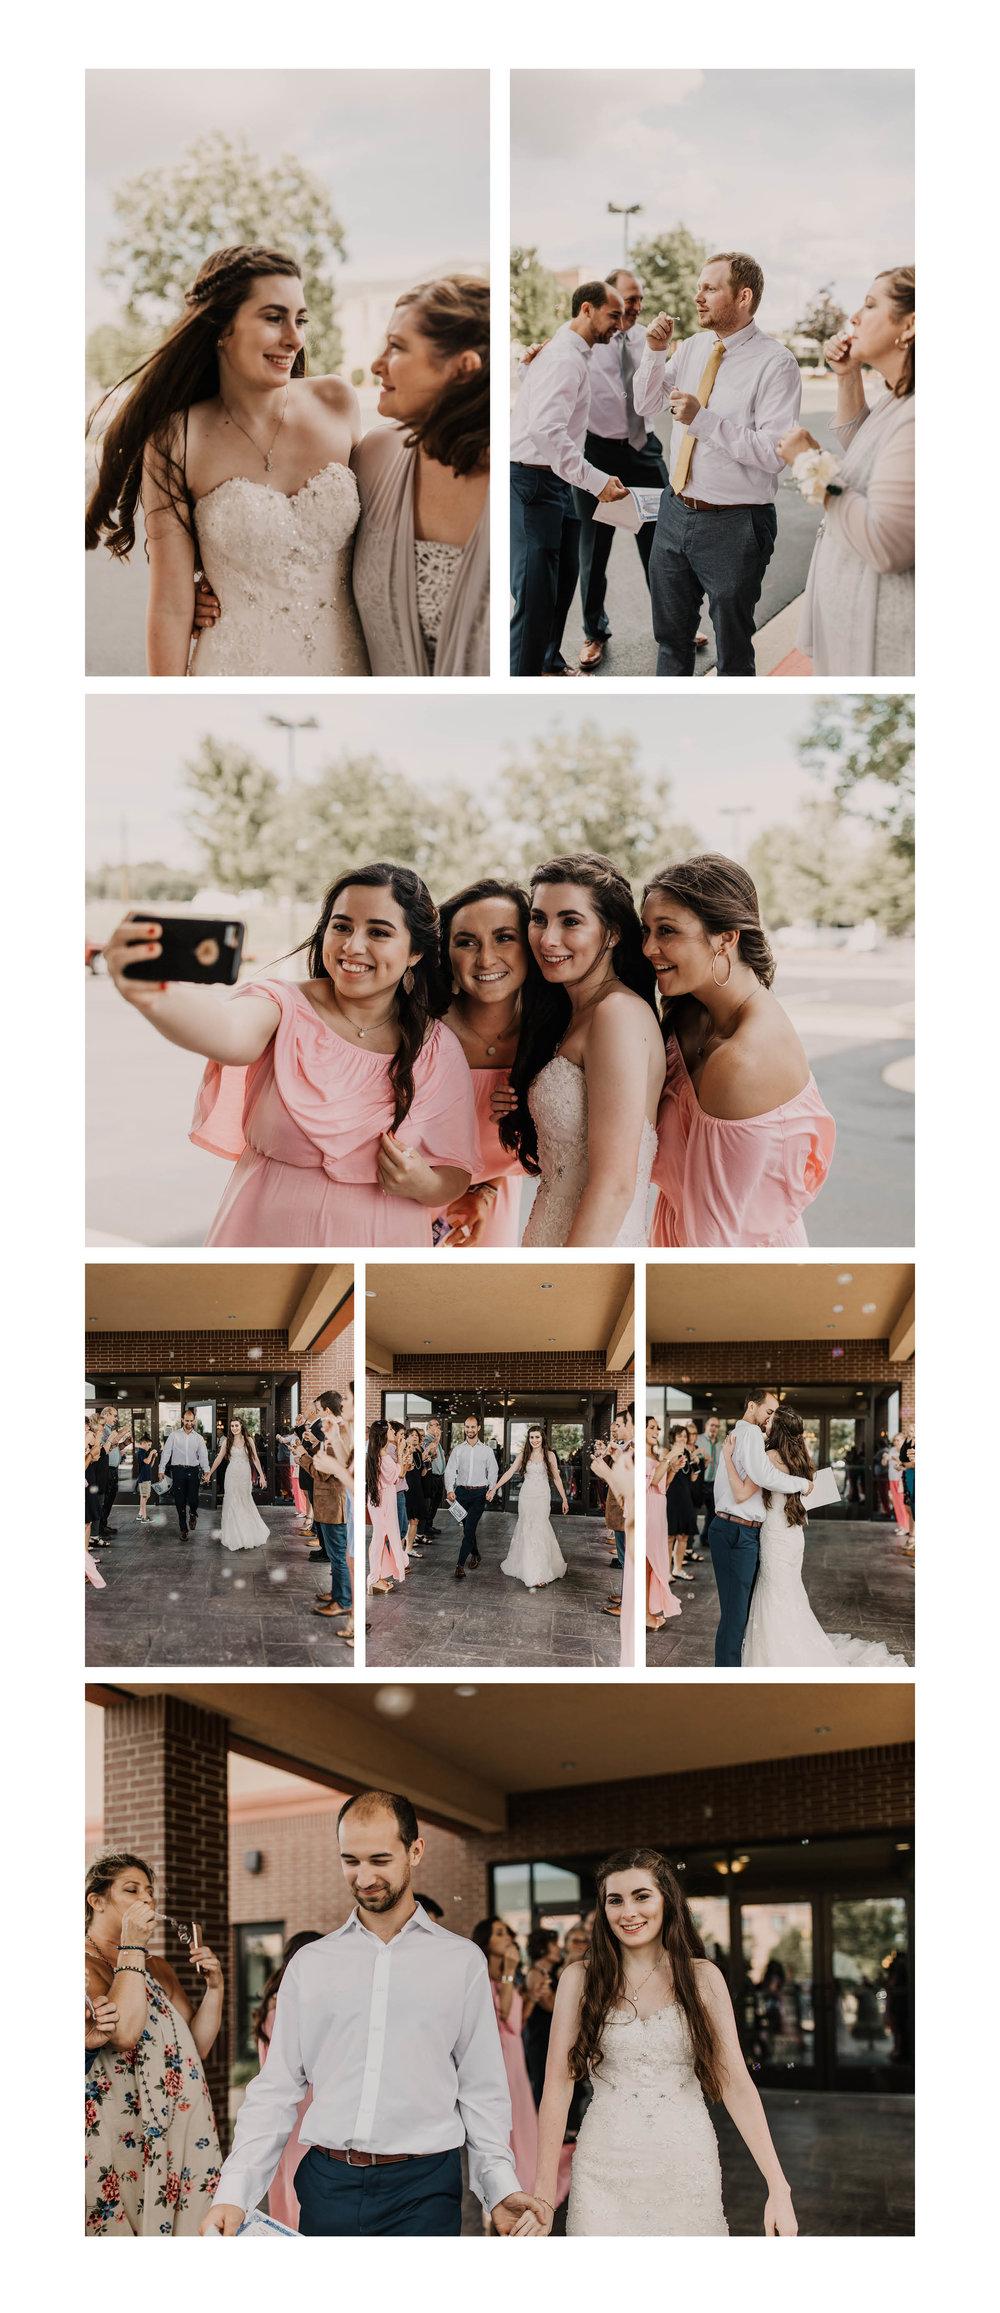 bubble-exit-fort-smith-arkansas-wedding-photographer